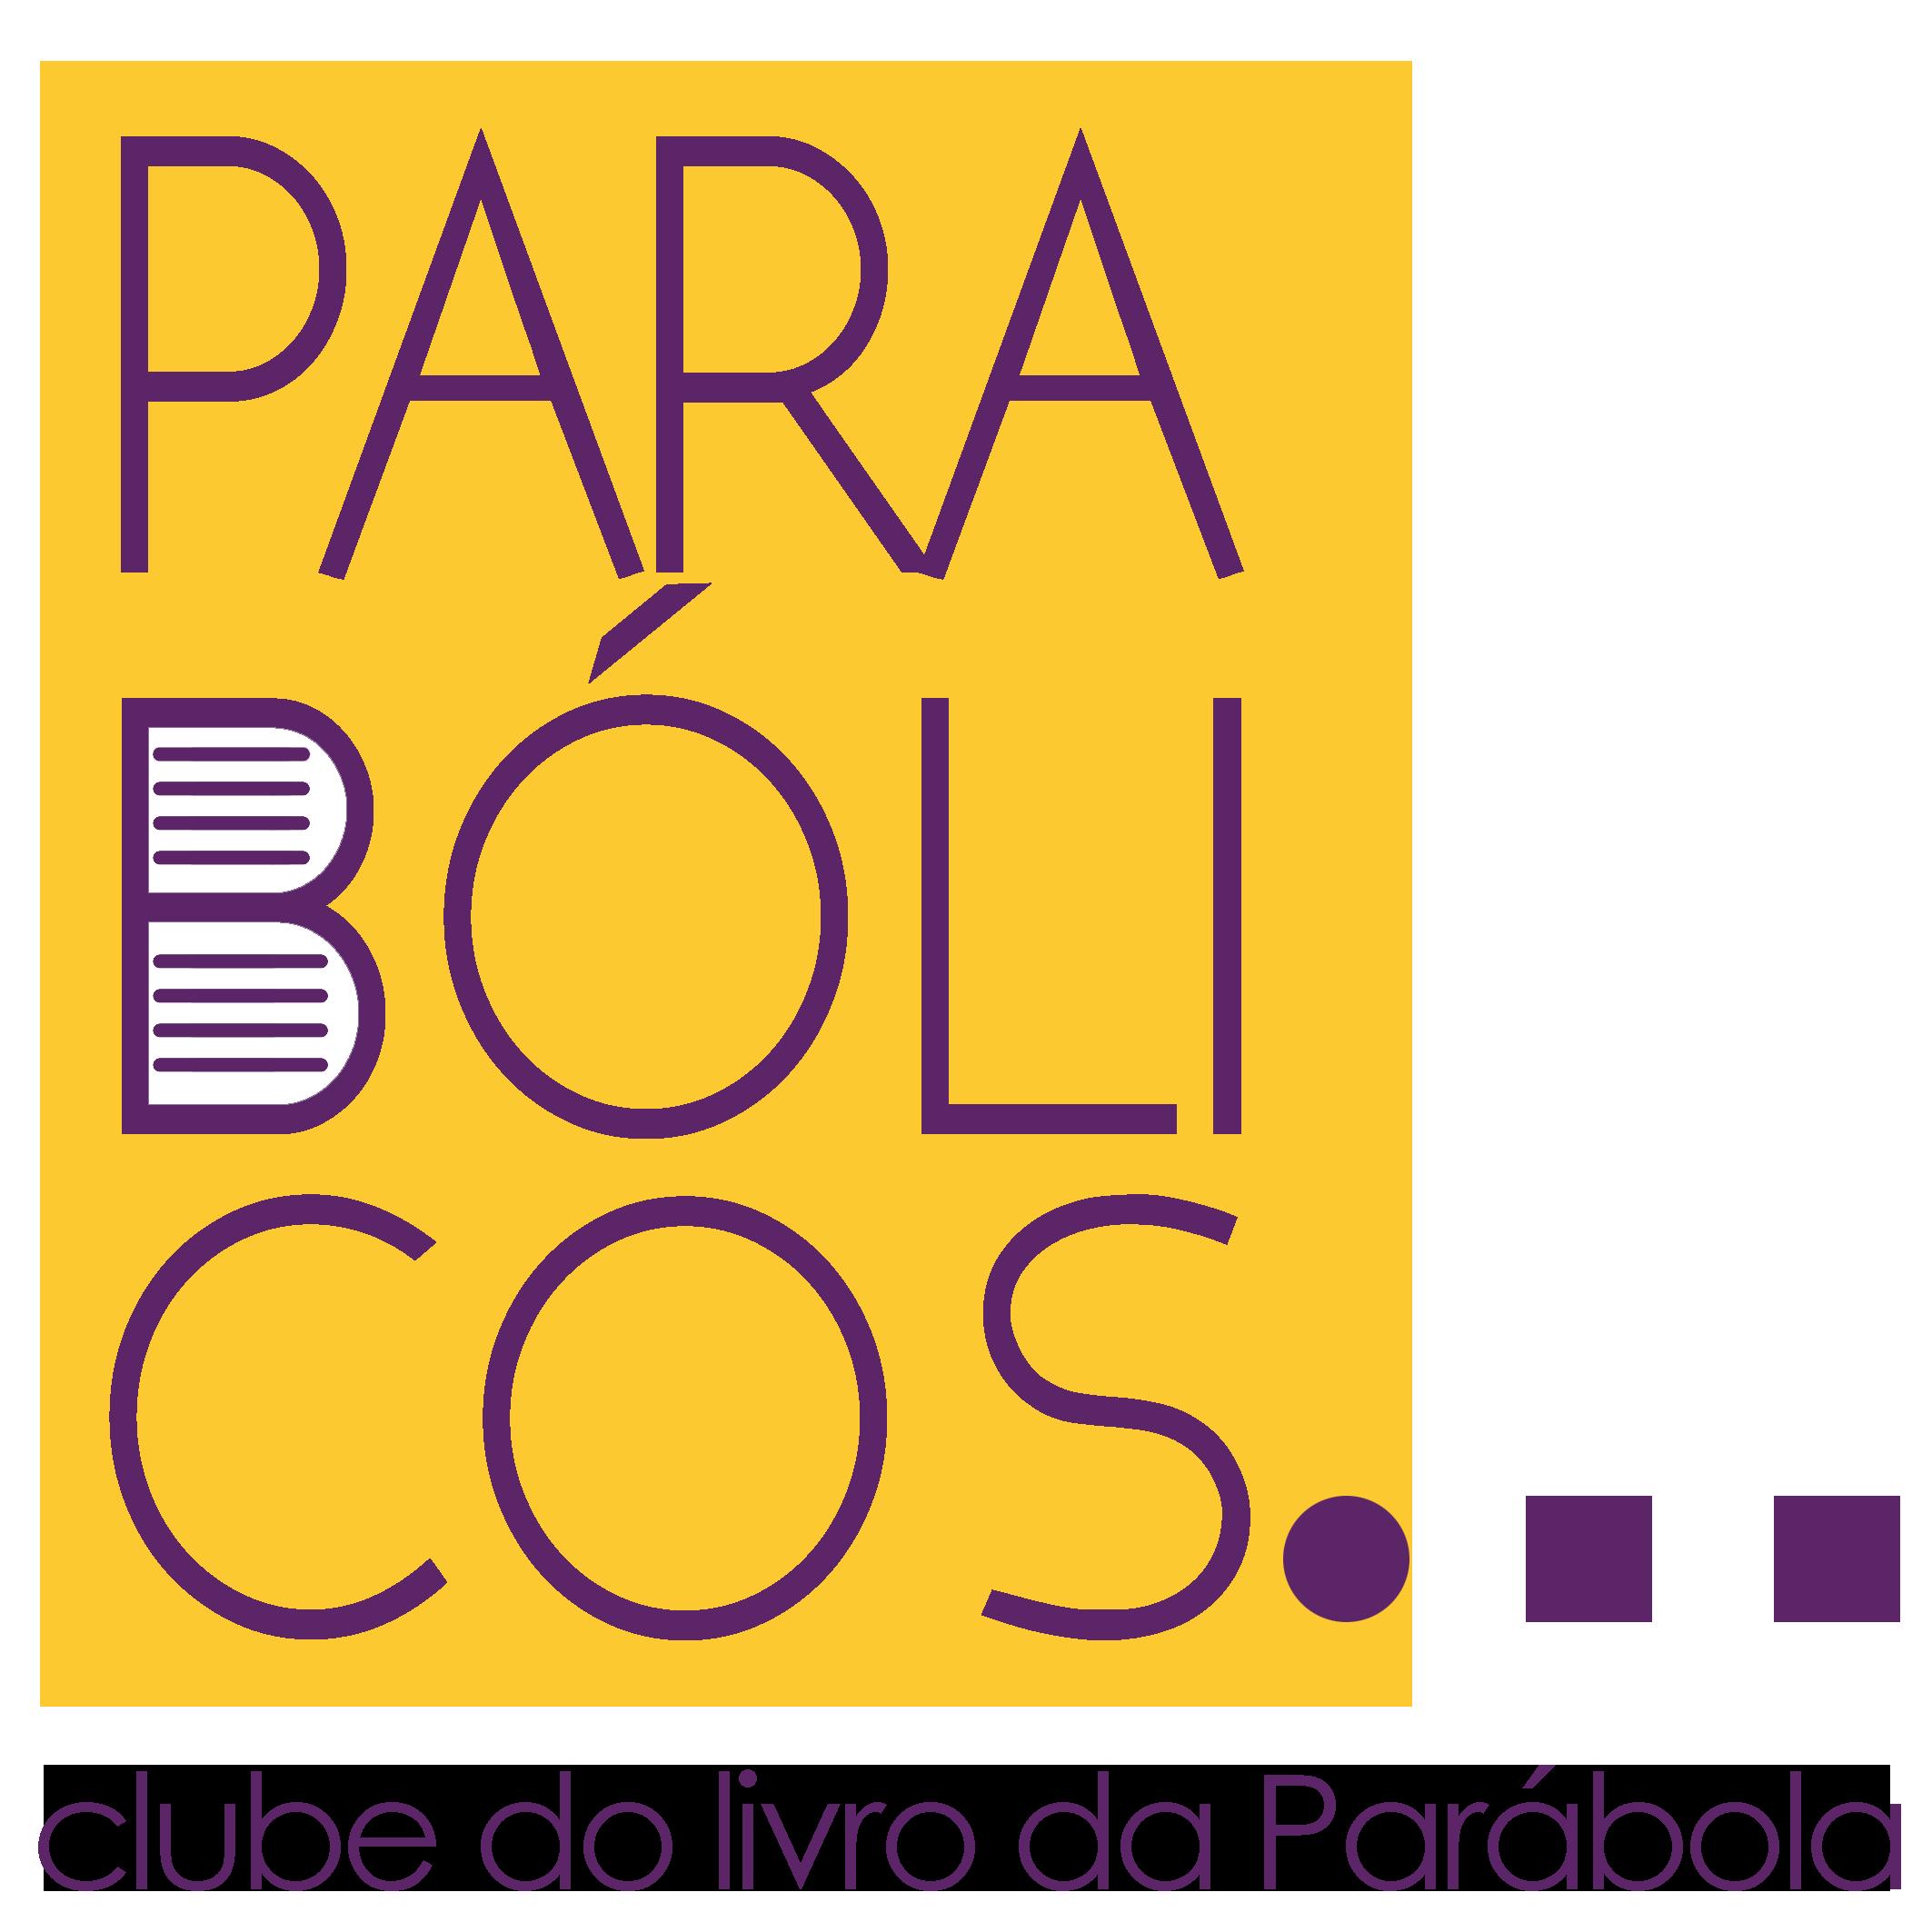 Parabolicos